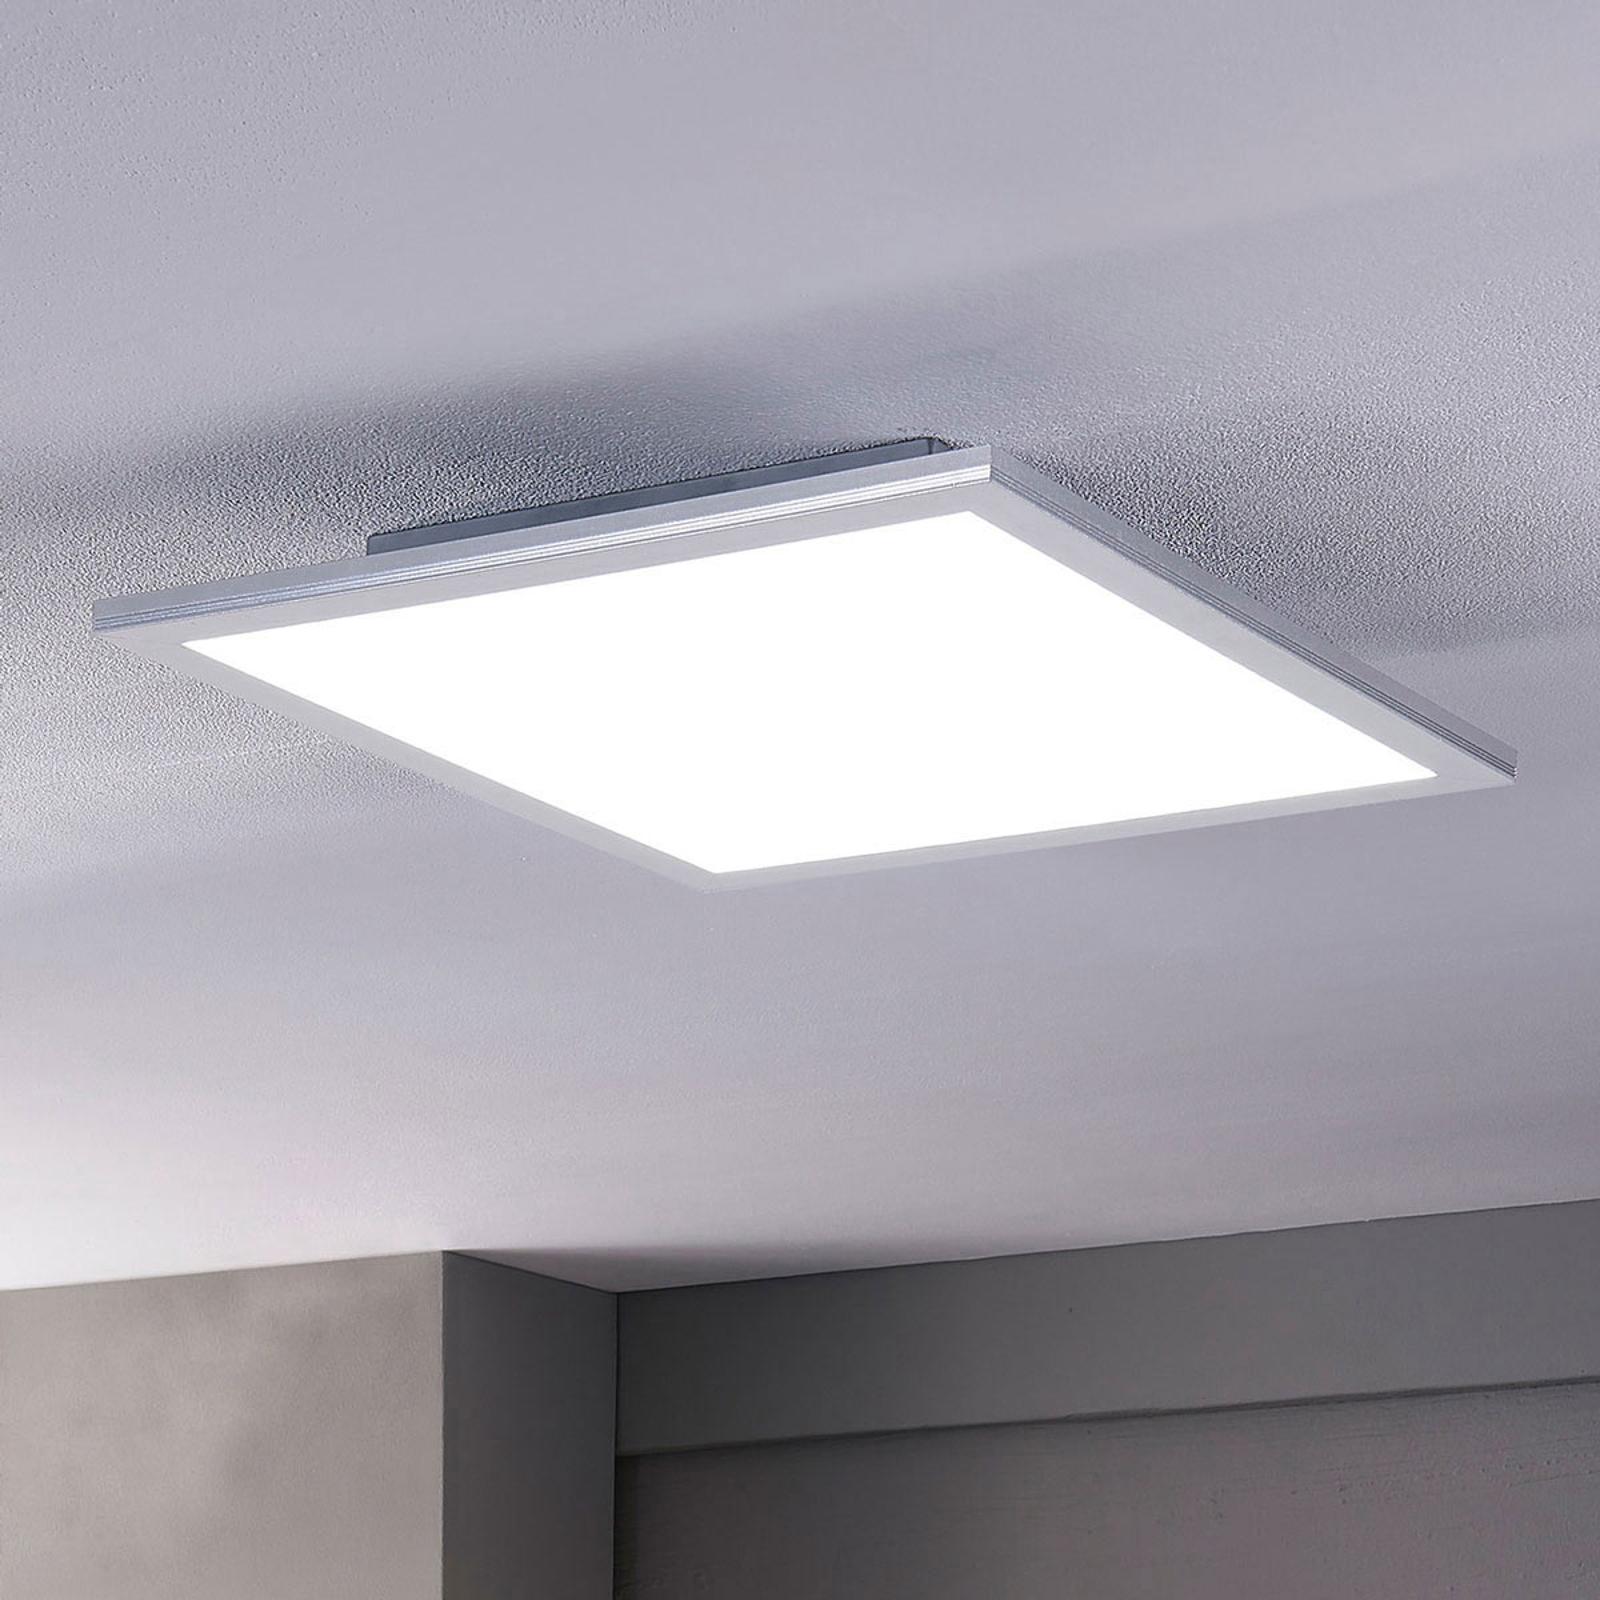 Lindby Livel LED-panel, CCT, 119 x 40 cm